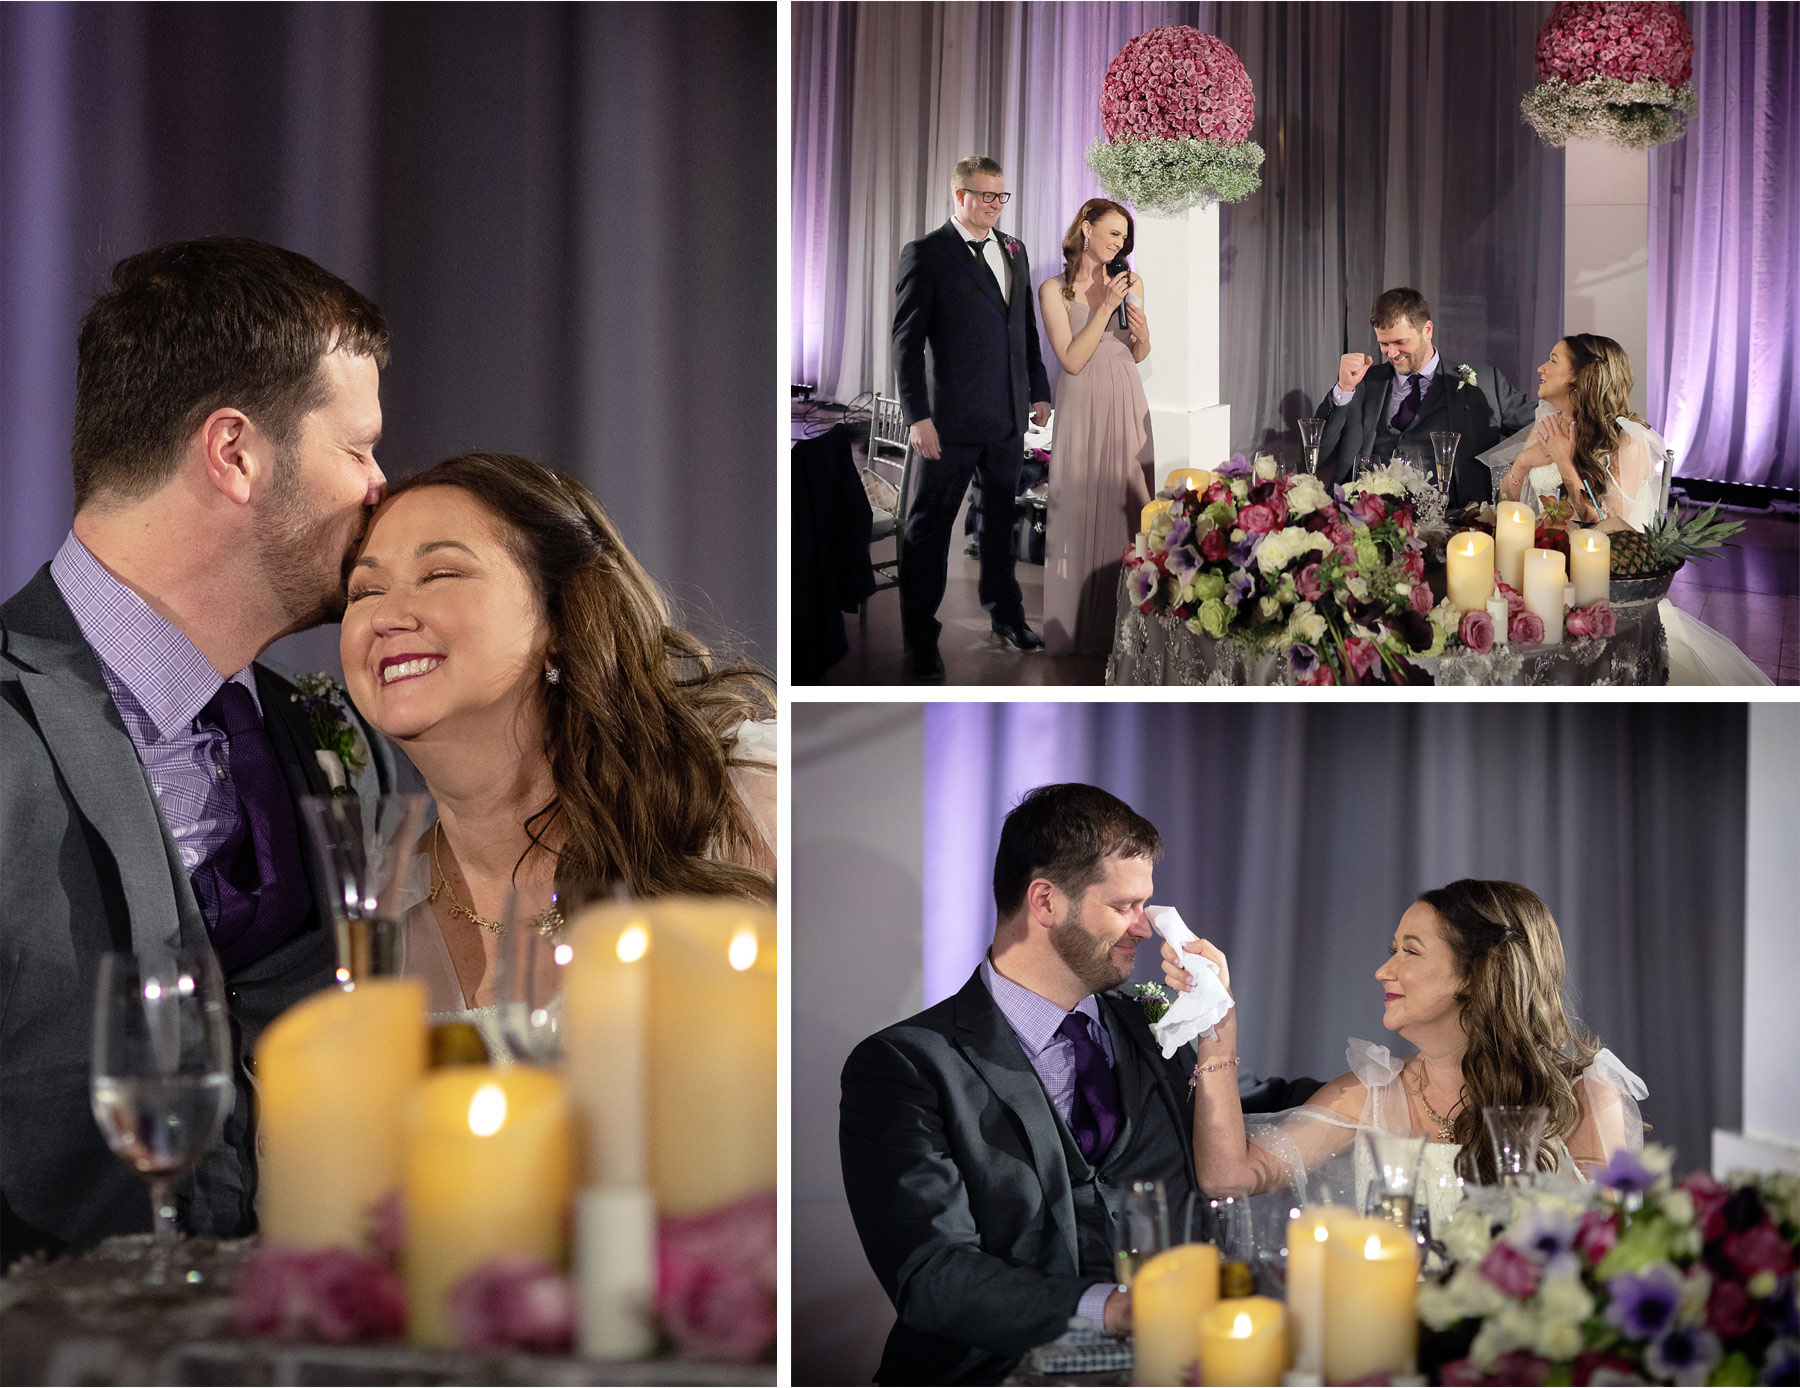 17-Saint-Paul-Minnesota-Wedding-by-Vick-Photography-Union-Depot-Lifetime-Network-David-Tutera-My-Great-Big-Live-Wedding-Toasts-Reception-Jen-and-Rob.jpg